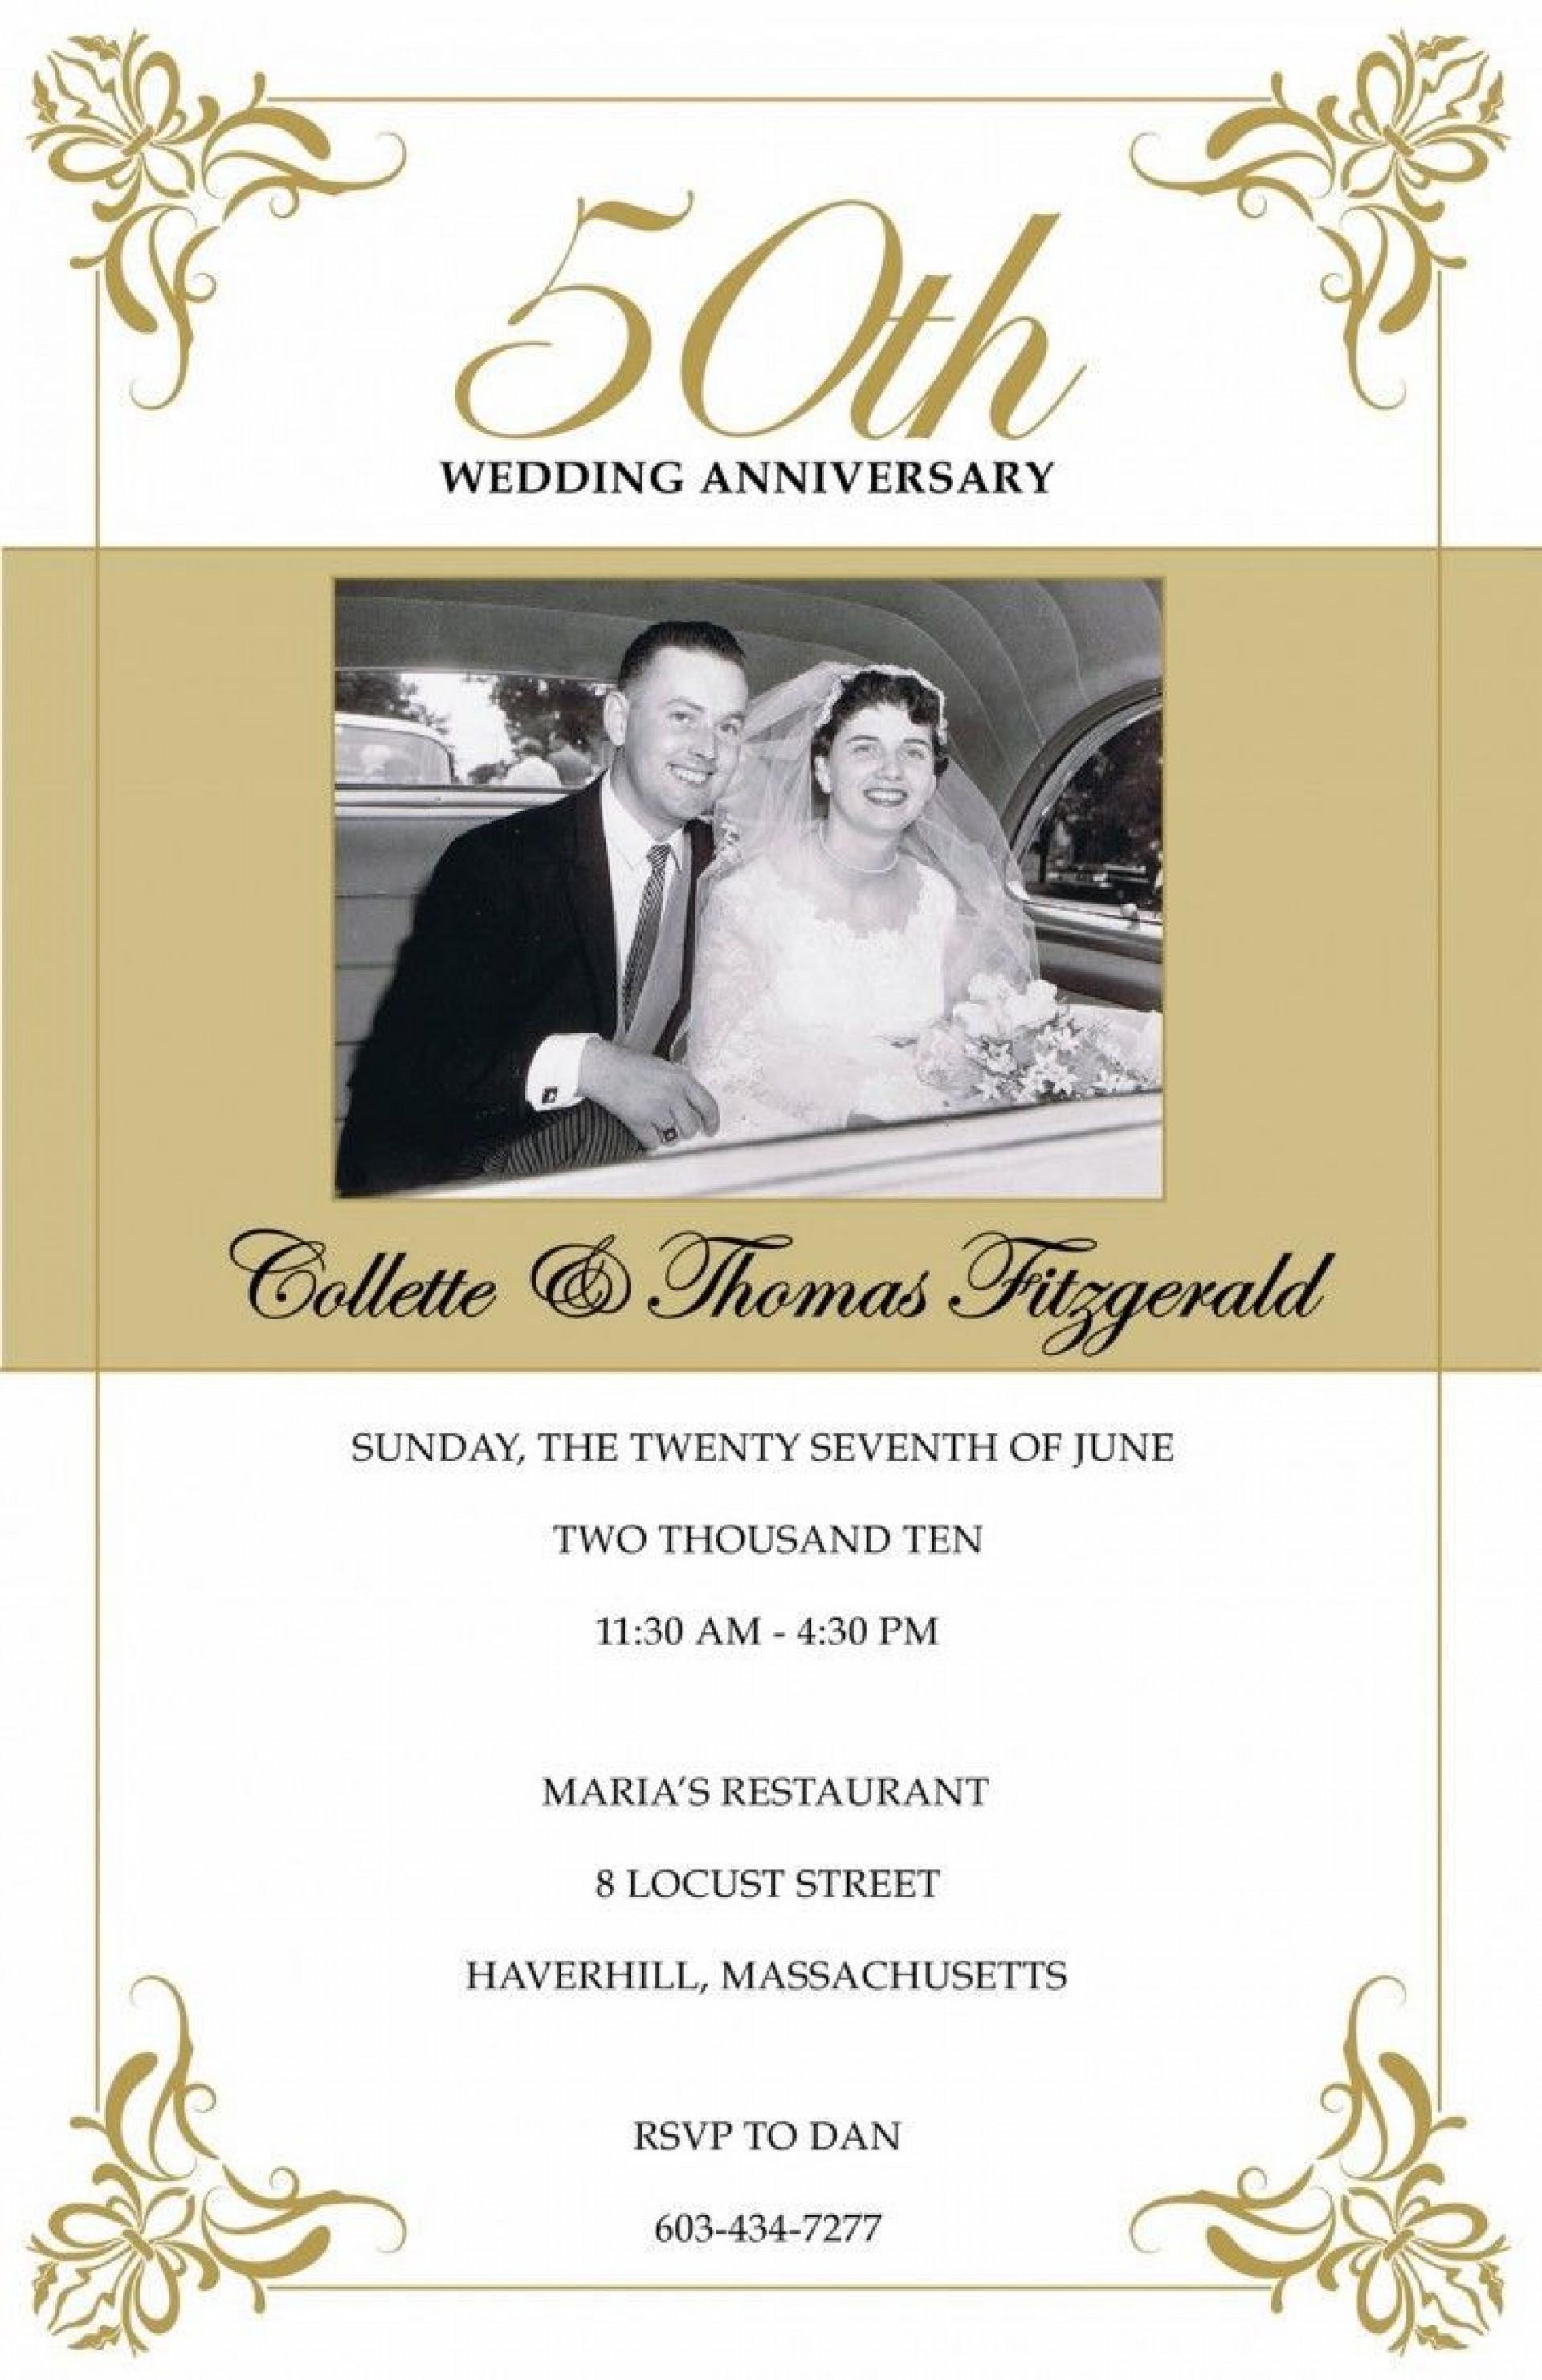 008 Wonderful 50th Wedding Anniversary Party Invitation Template Design  Templates Free1920